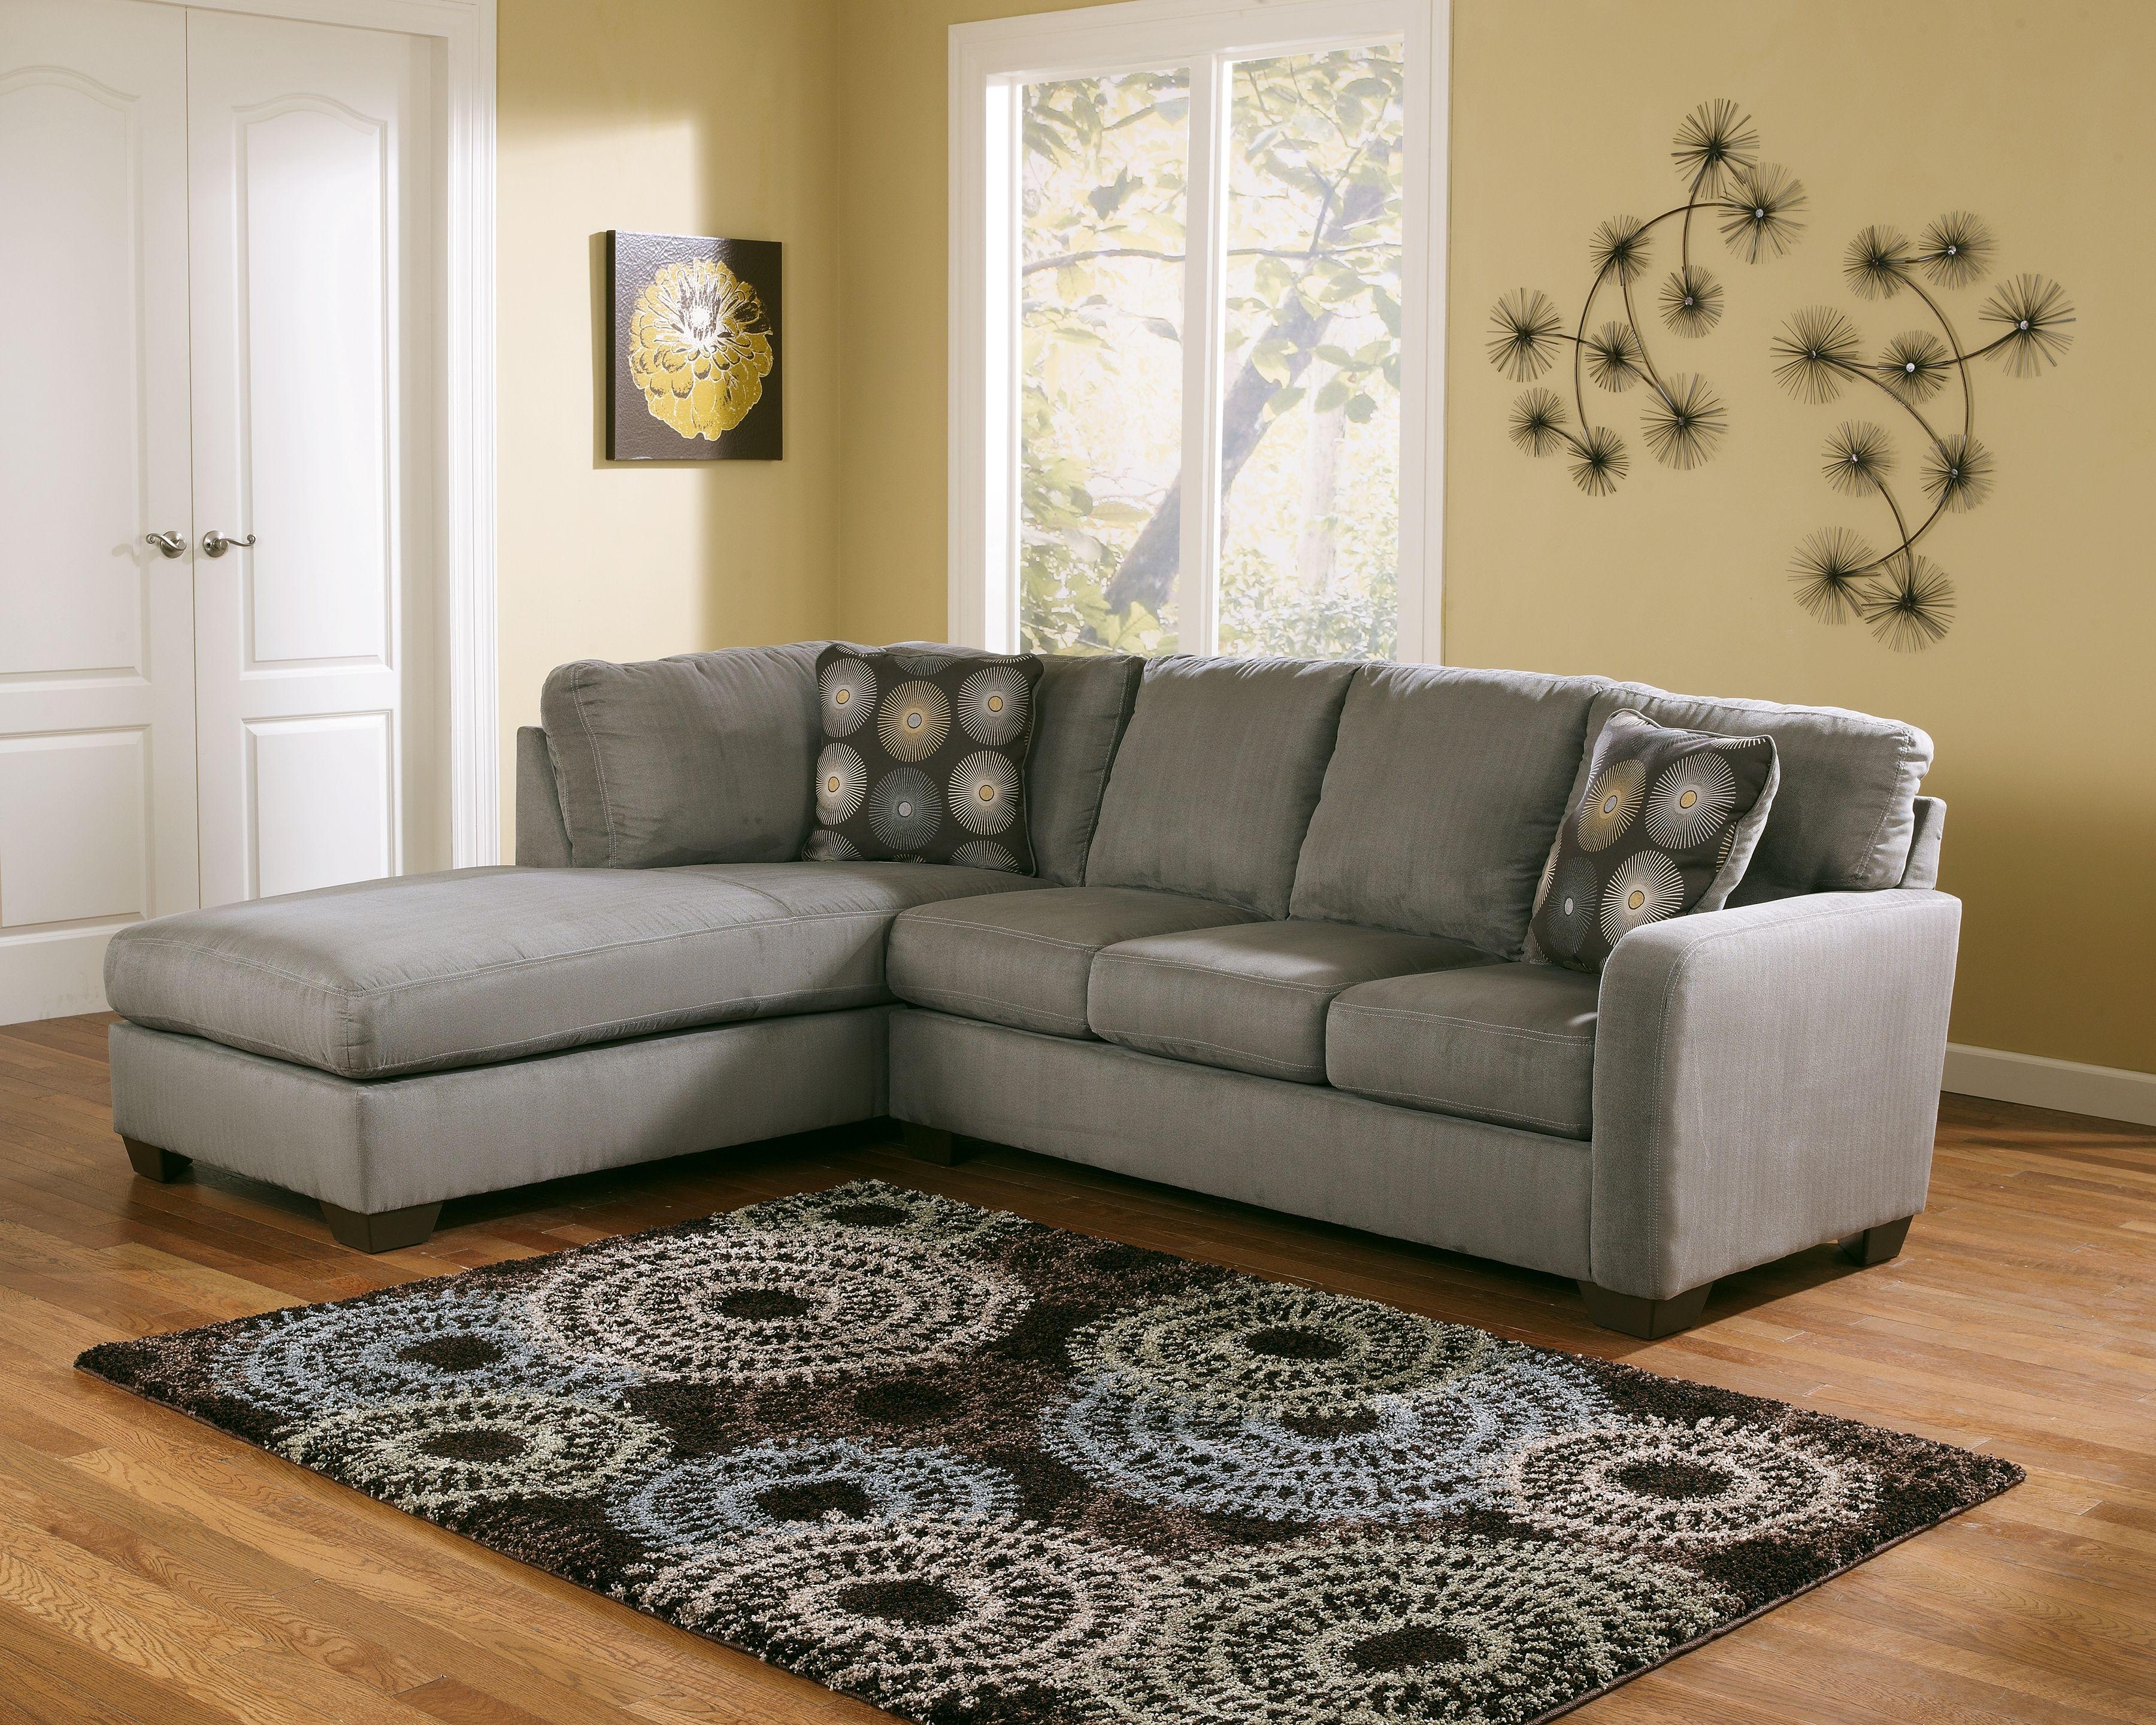 Zella 2-Piece Sectional, Charcoal | Grey sectional sofa ...